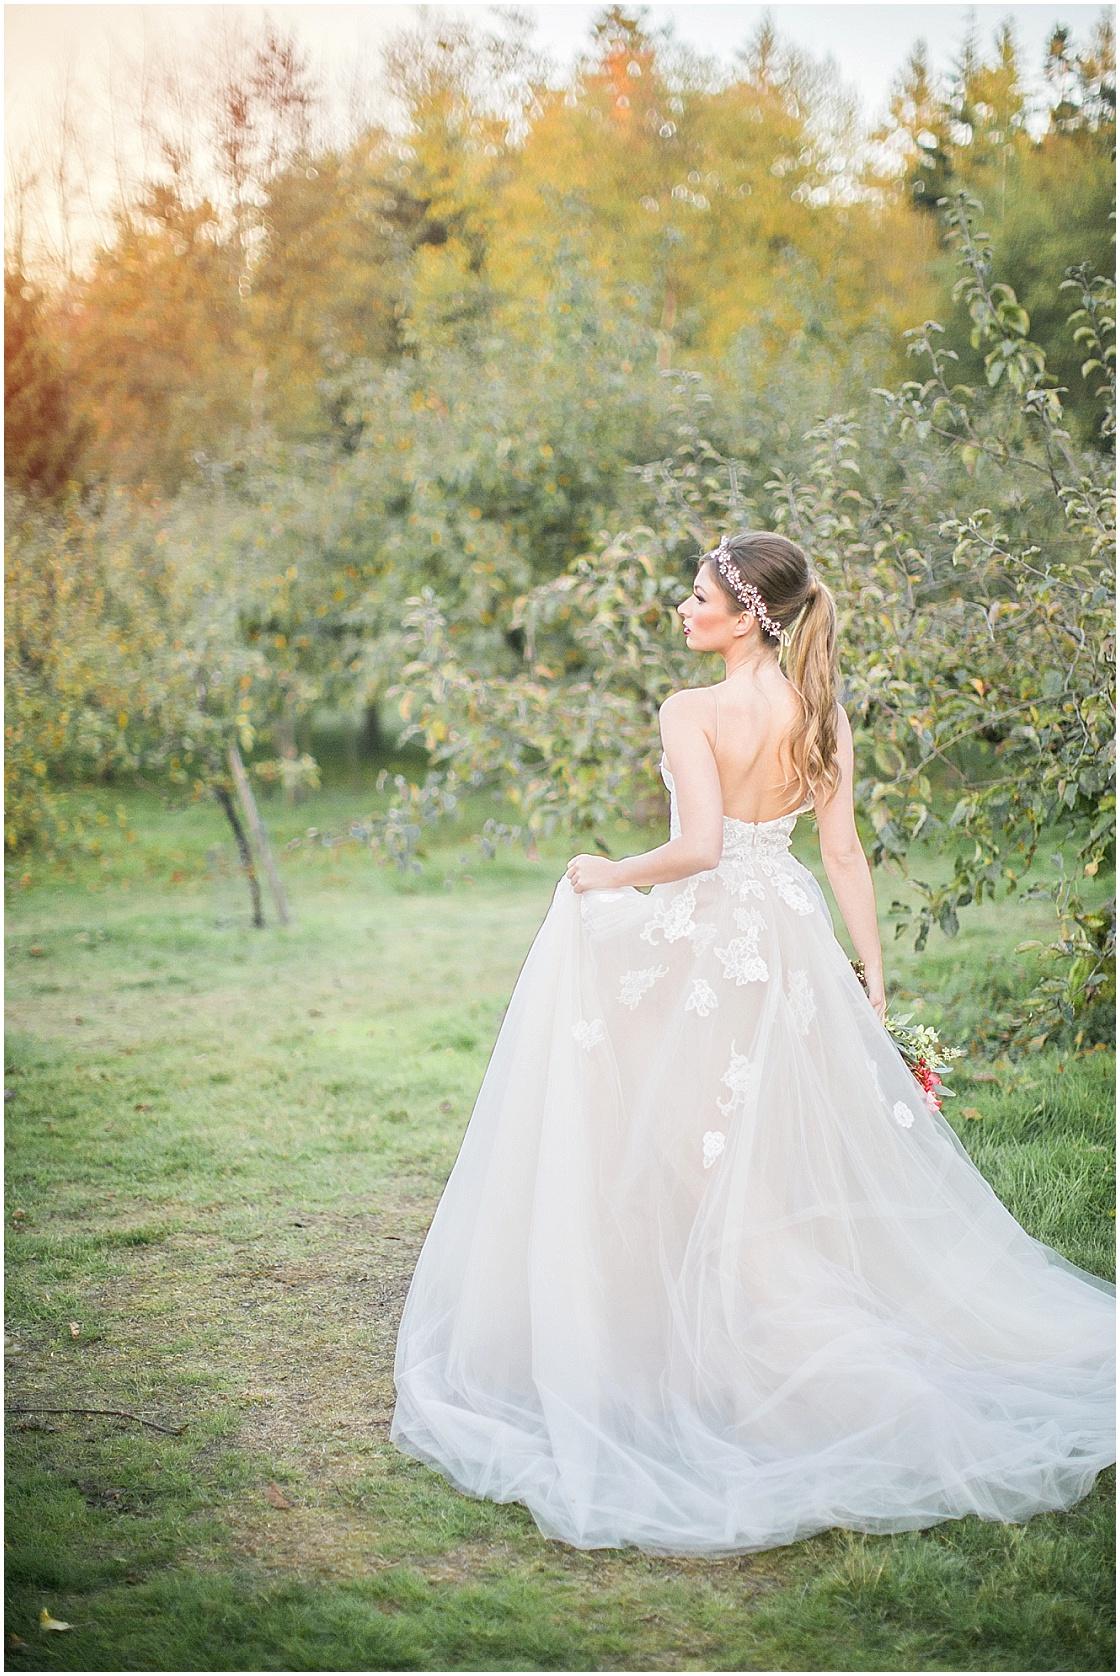 Snow White Wedding Inspiration | Disney Wedding | Simply Sweet Photography by Nomo Akisawa | Joy Wed blog | http://www.joy-wed.com